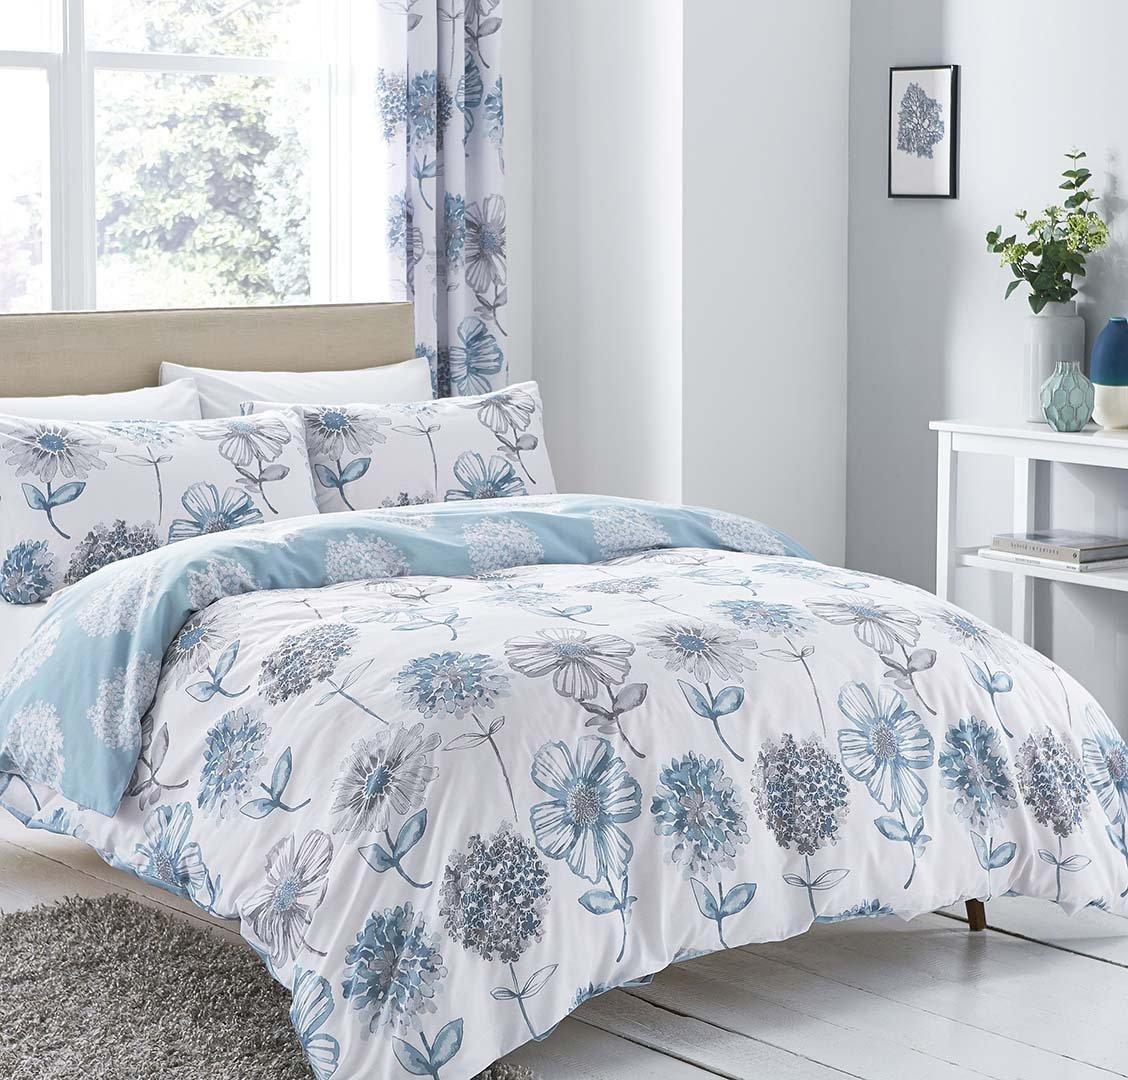 Image of Catherine Lansfield Blue Floral Bedding Set - Kingsize.